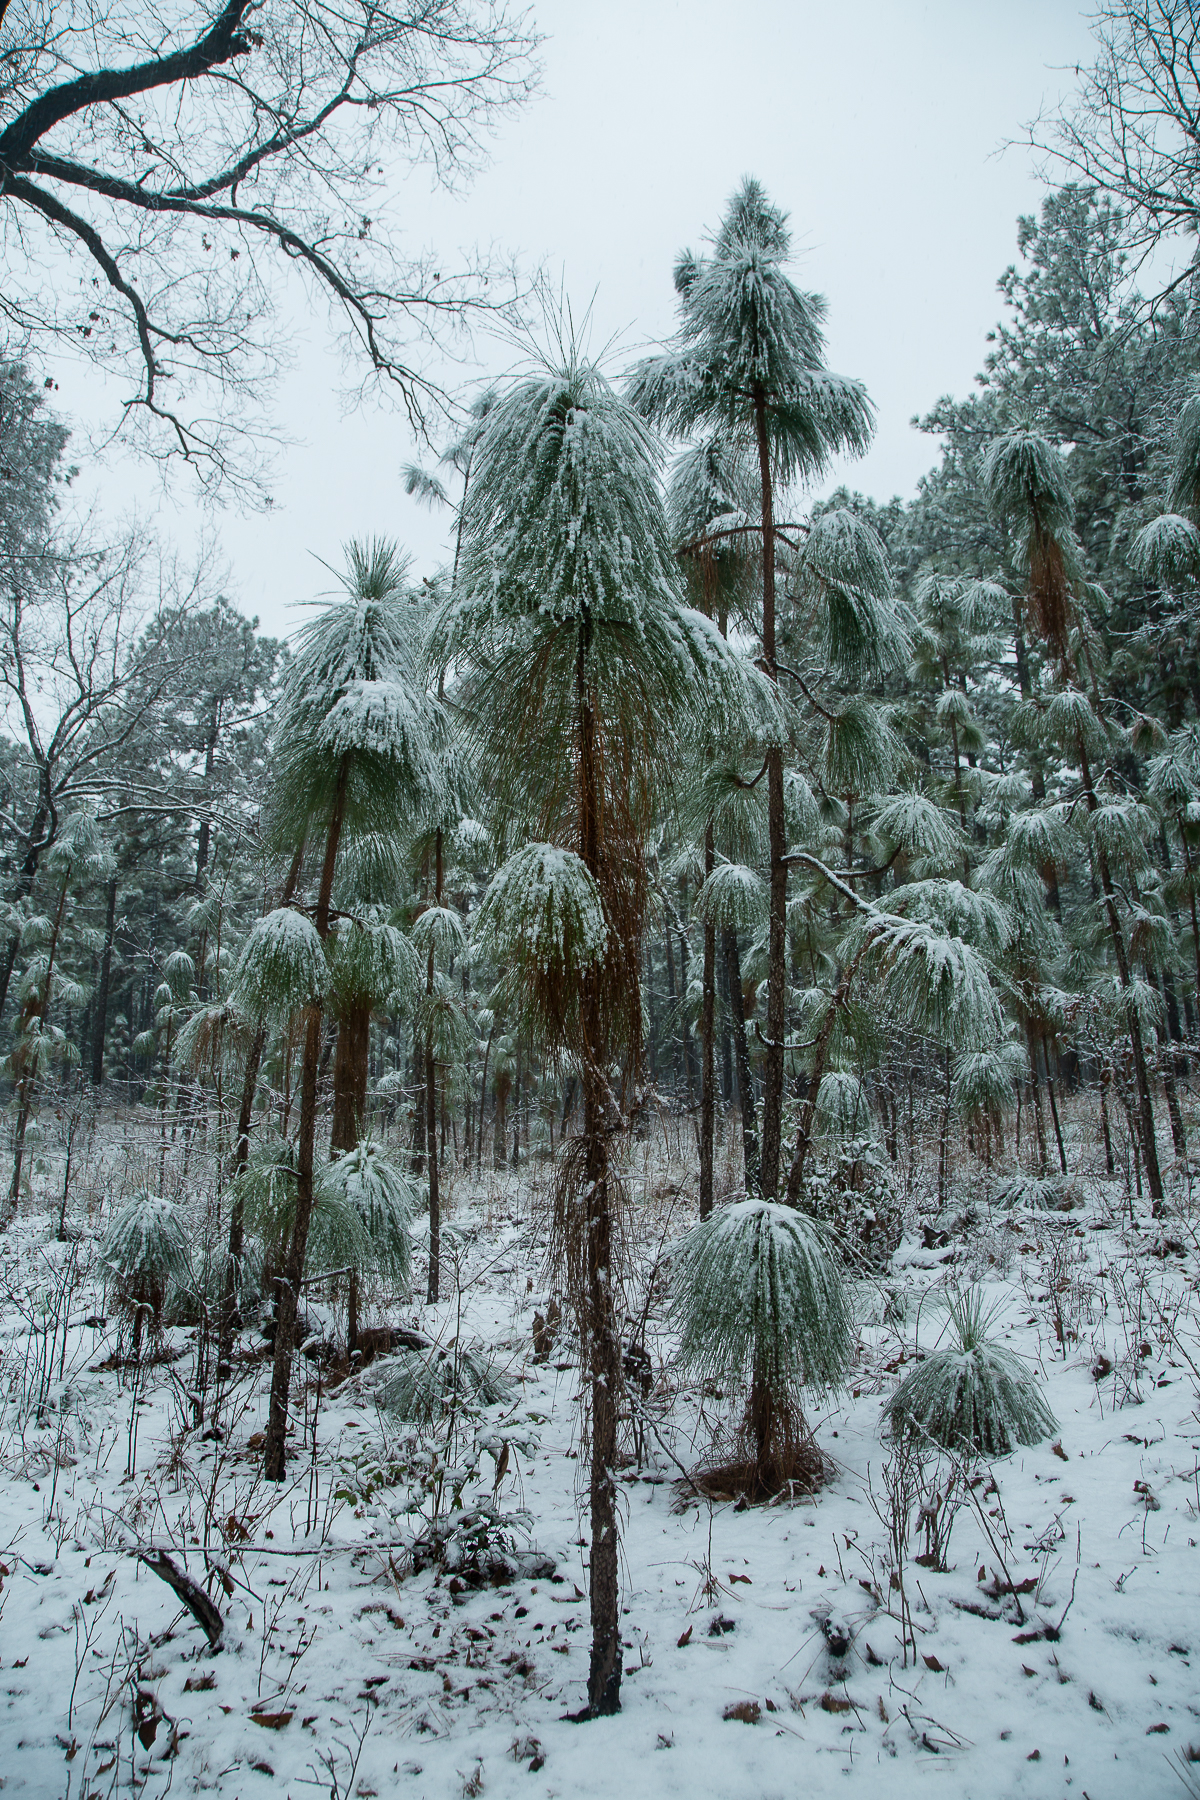 Gioia_Kuss_Long Leaf Pines (Take my Breath Away)_-Long-leaf Pines Posing as Truffula Trees 5.jpg